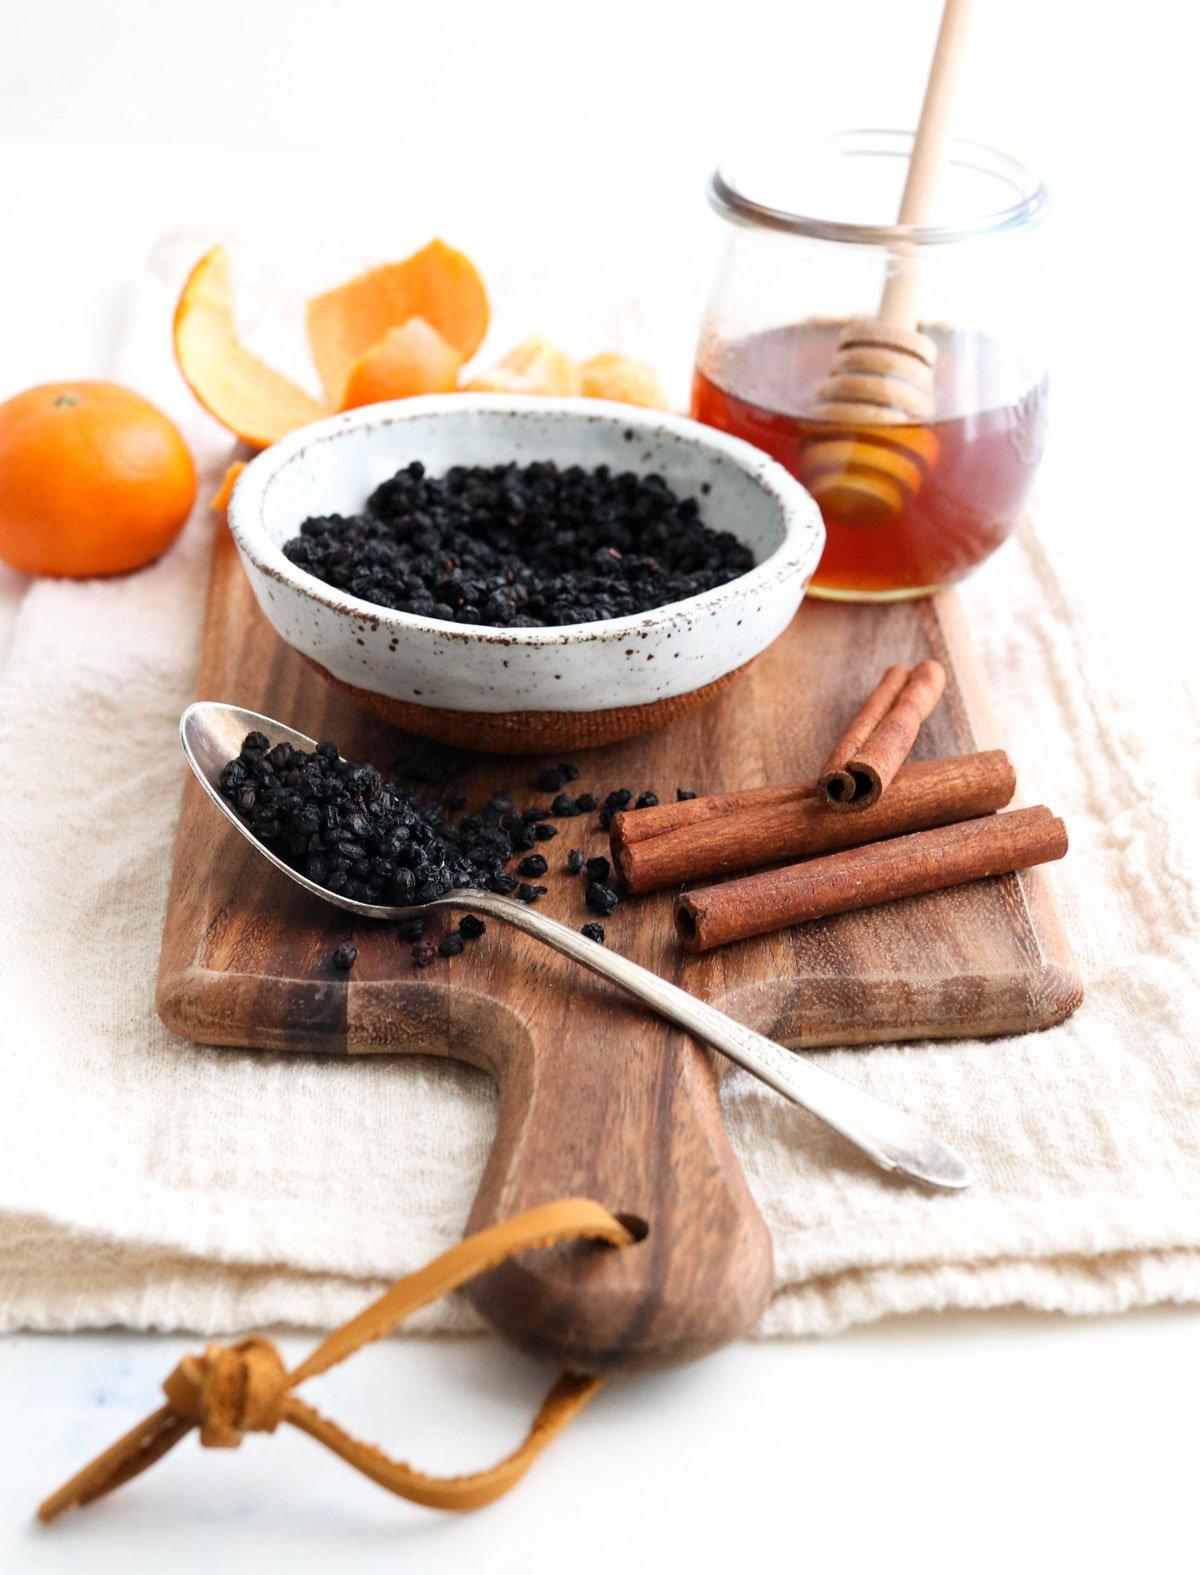 elderberry tea ingredients gathered